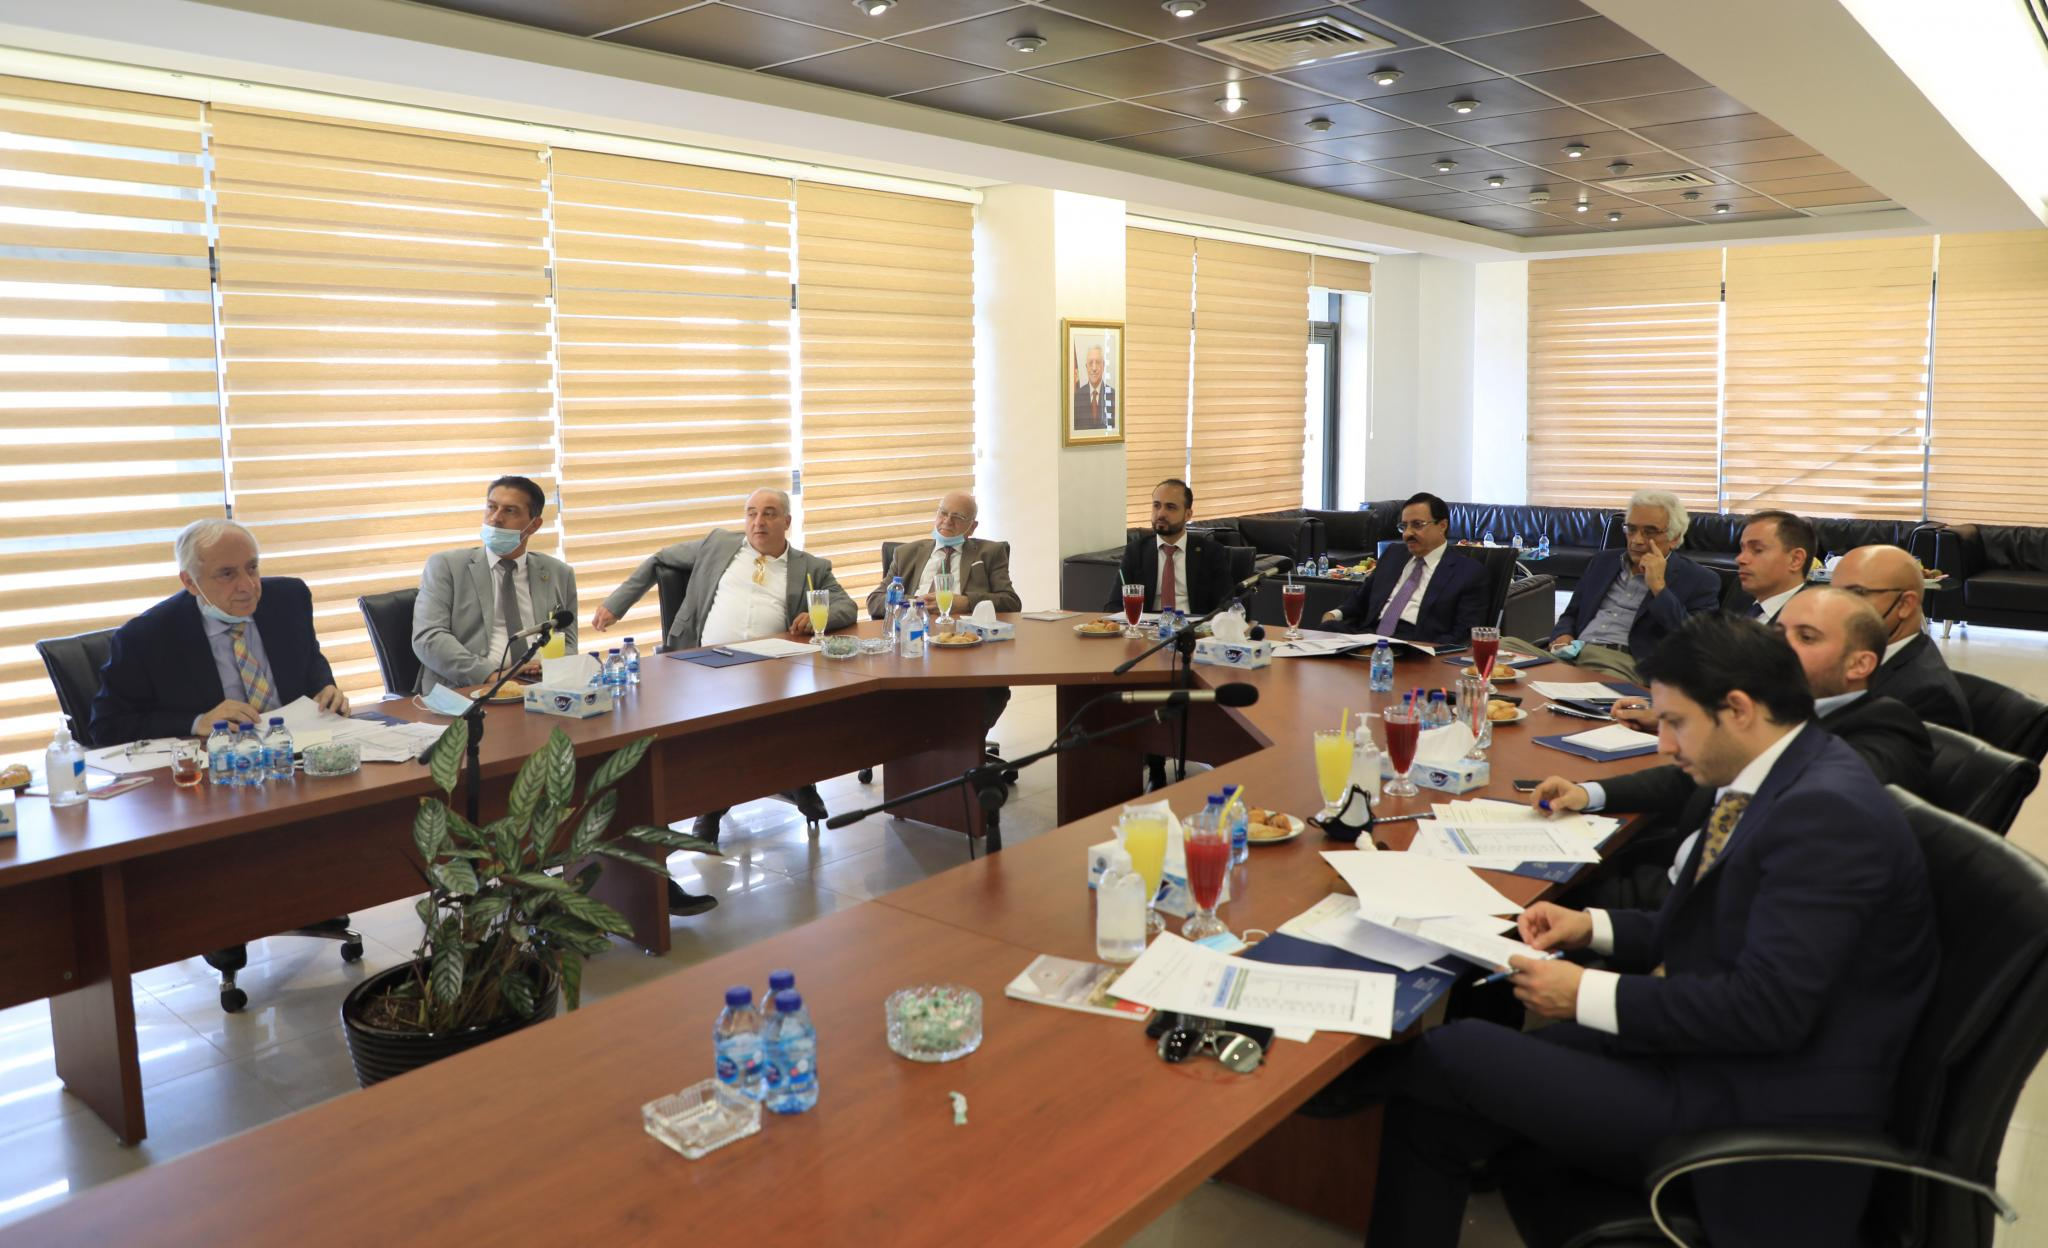 The Board of Directors meeting